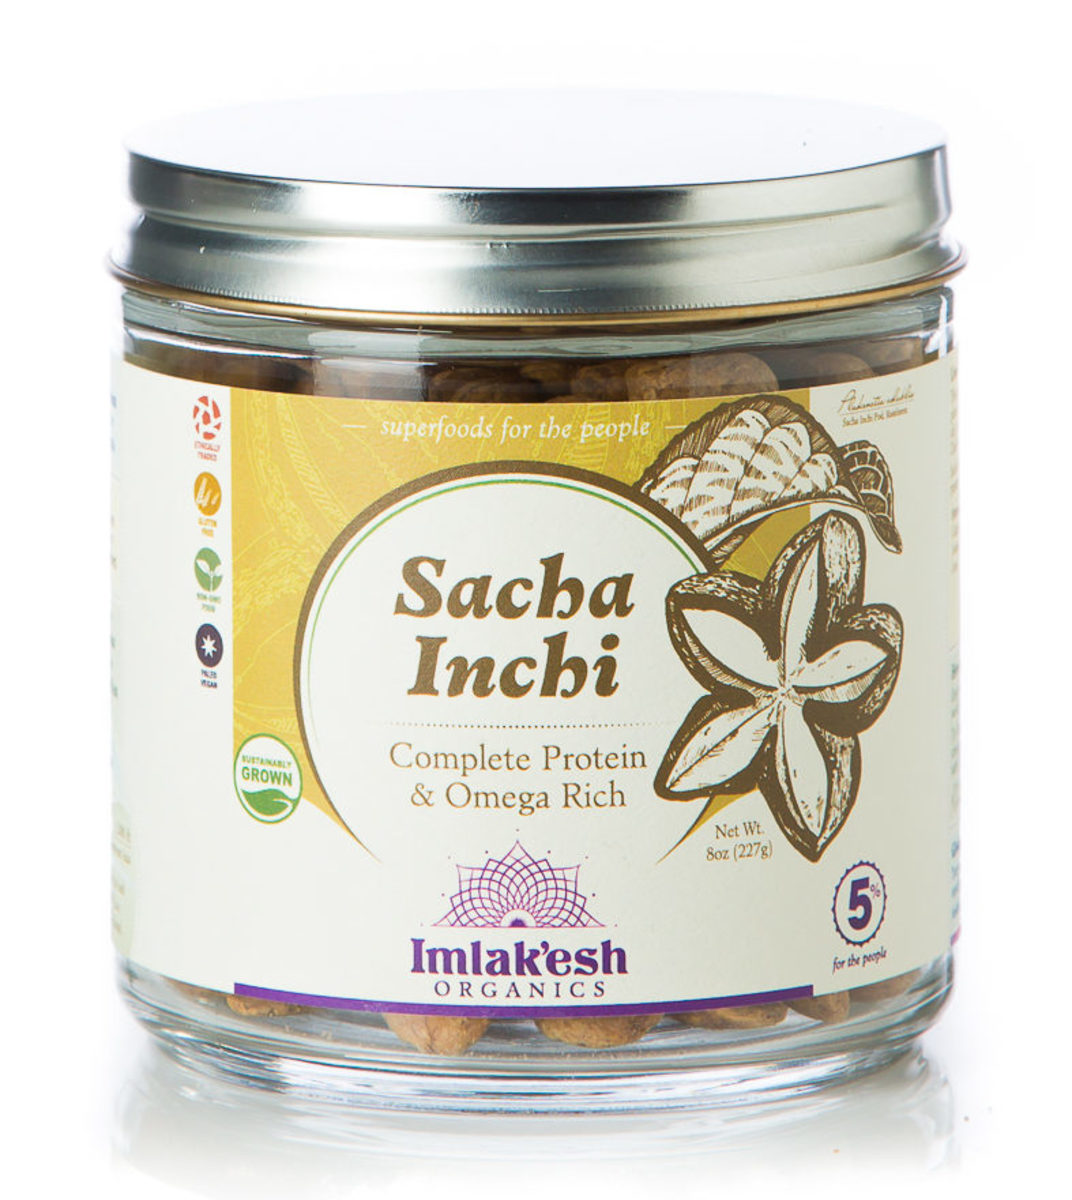 Imlakesh-2016--Small-(W)--Sacha-Inchi--1500